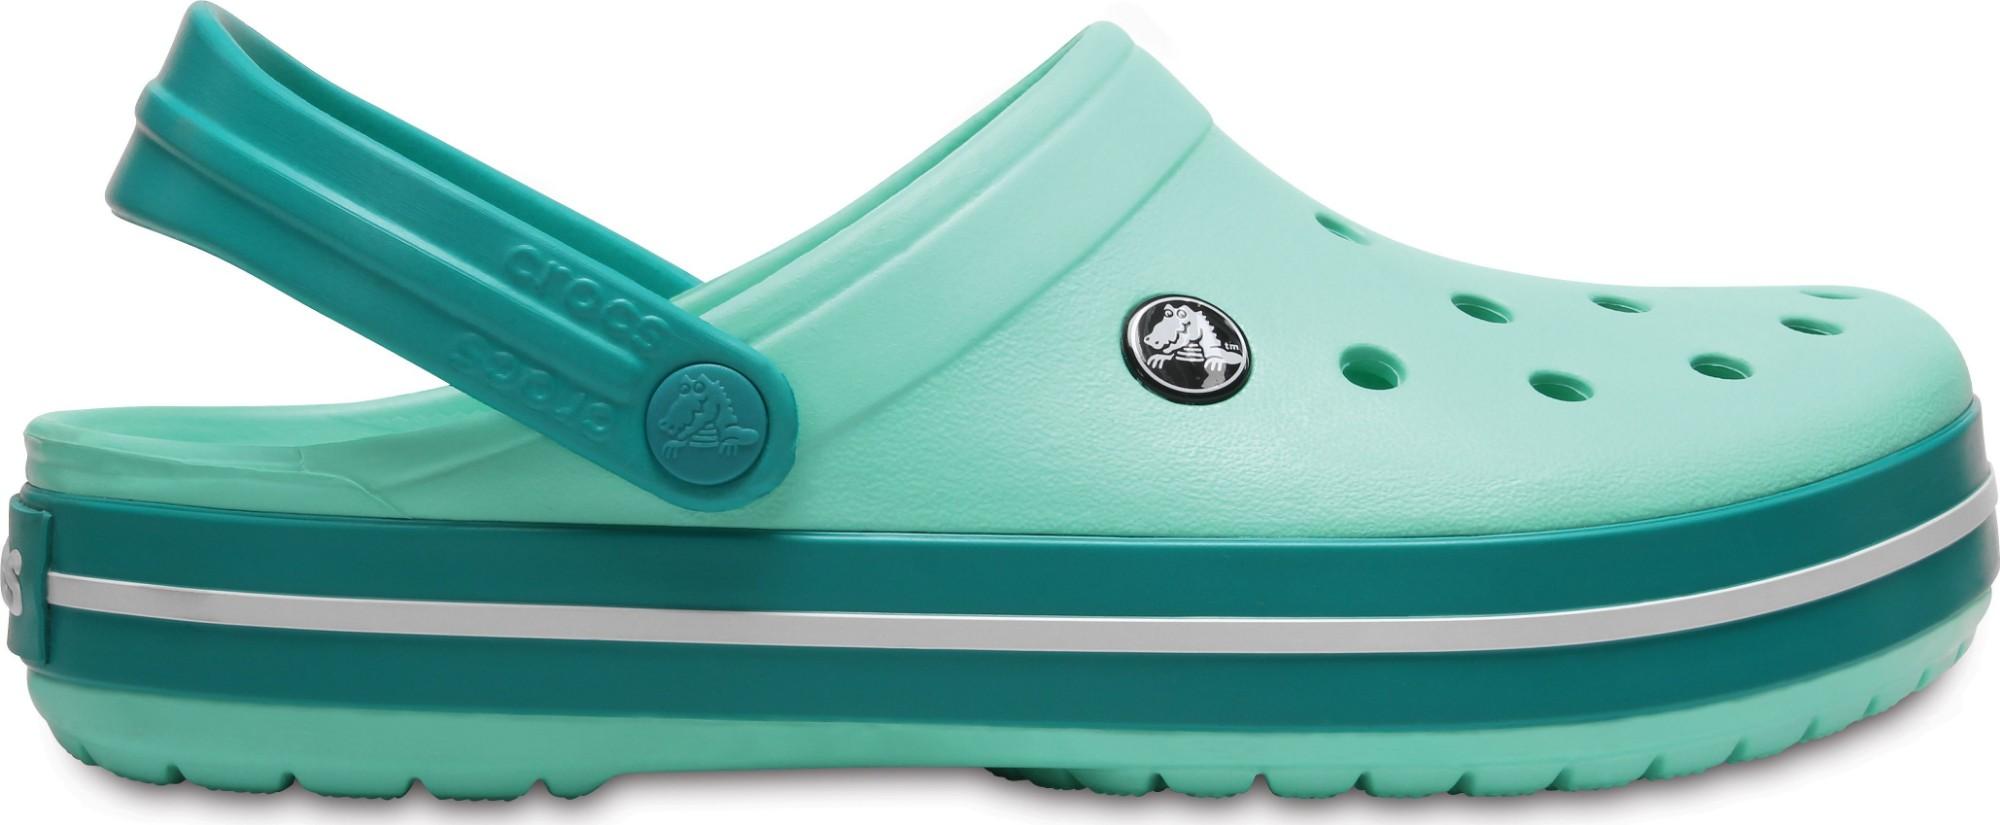 Crocs™ Crocband™ New Mint/Tropical Teal 37,5